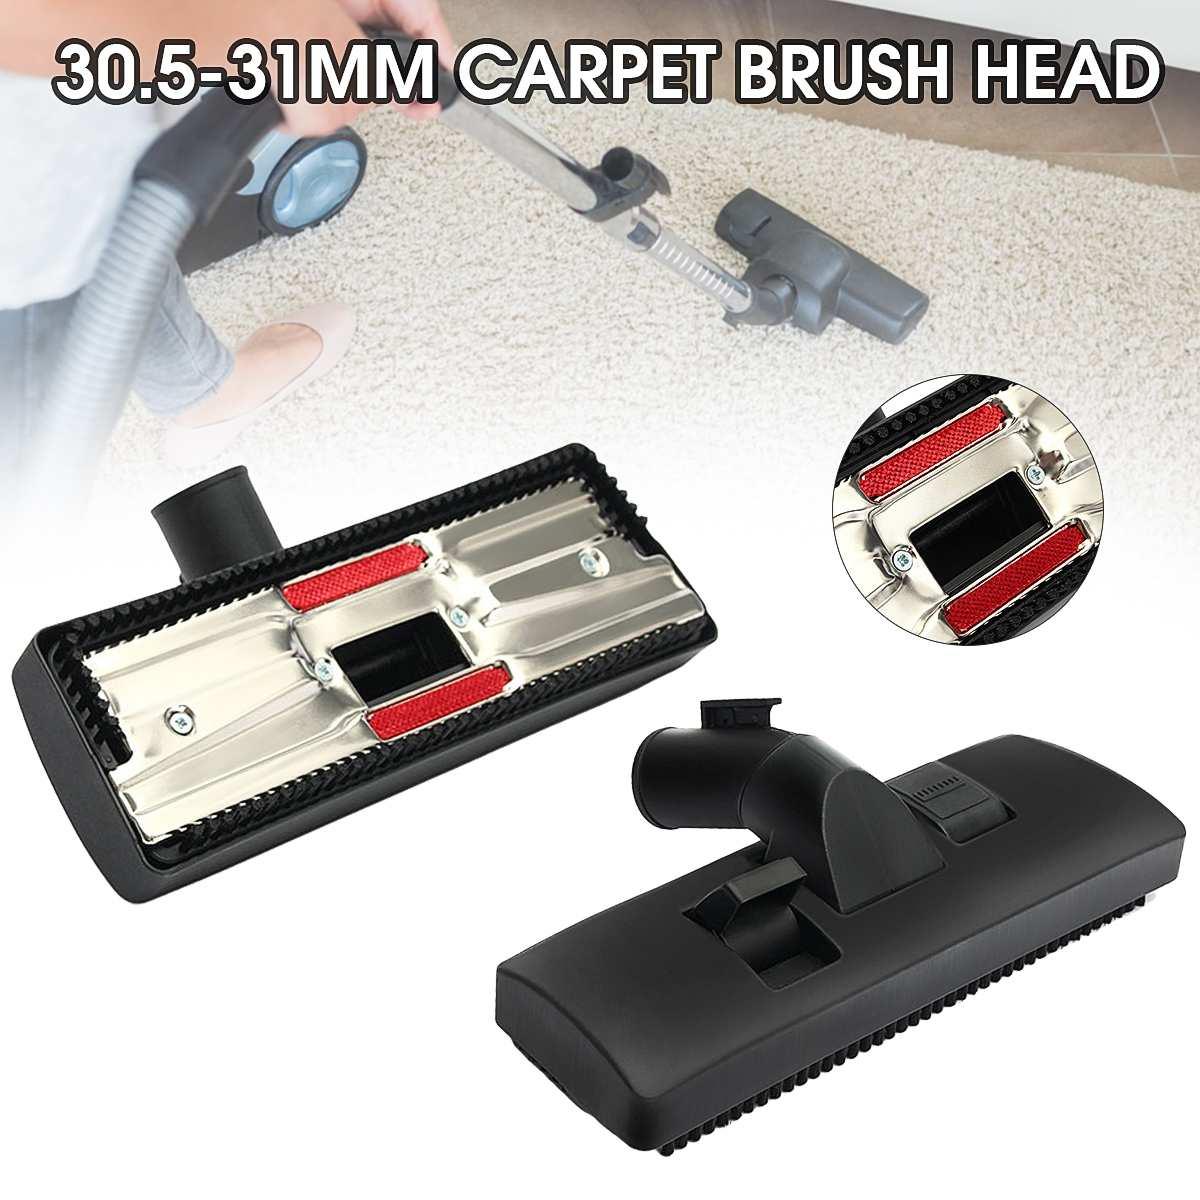 1Pcs Universal Inner Diameter 32mm Vacuum Cleaner Accessories Brush Head Tool Replacement Dusting Crevice Tool